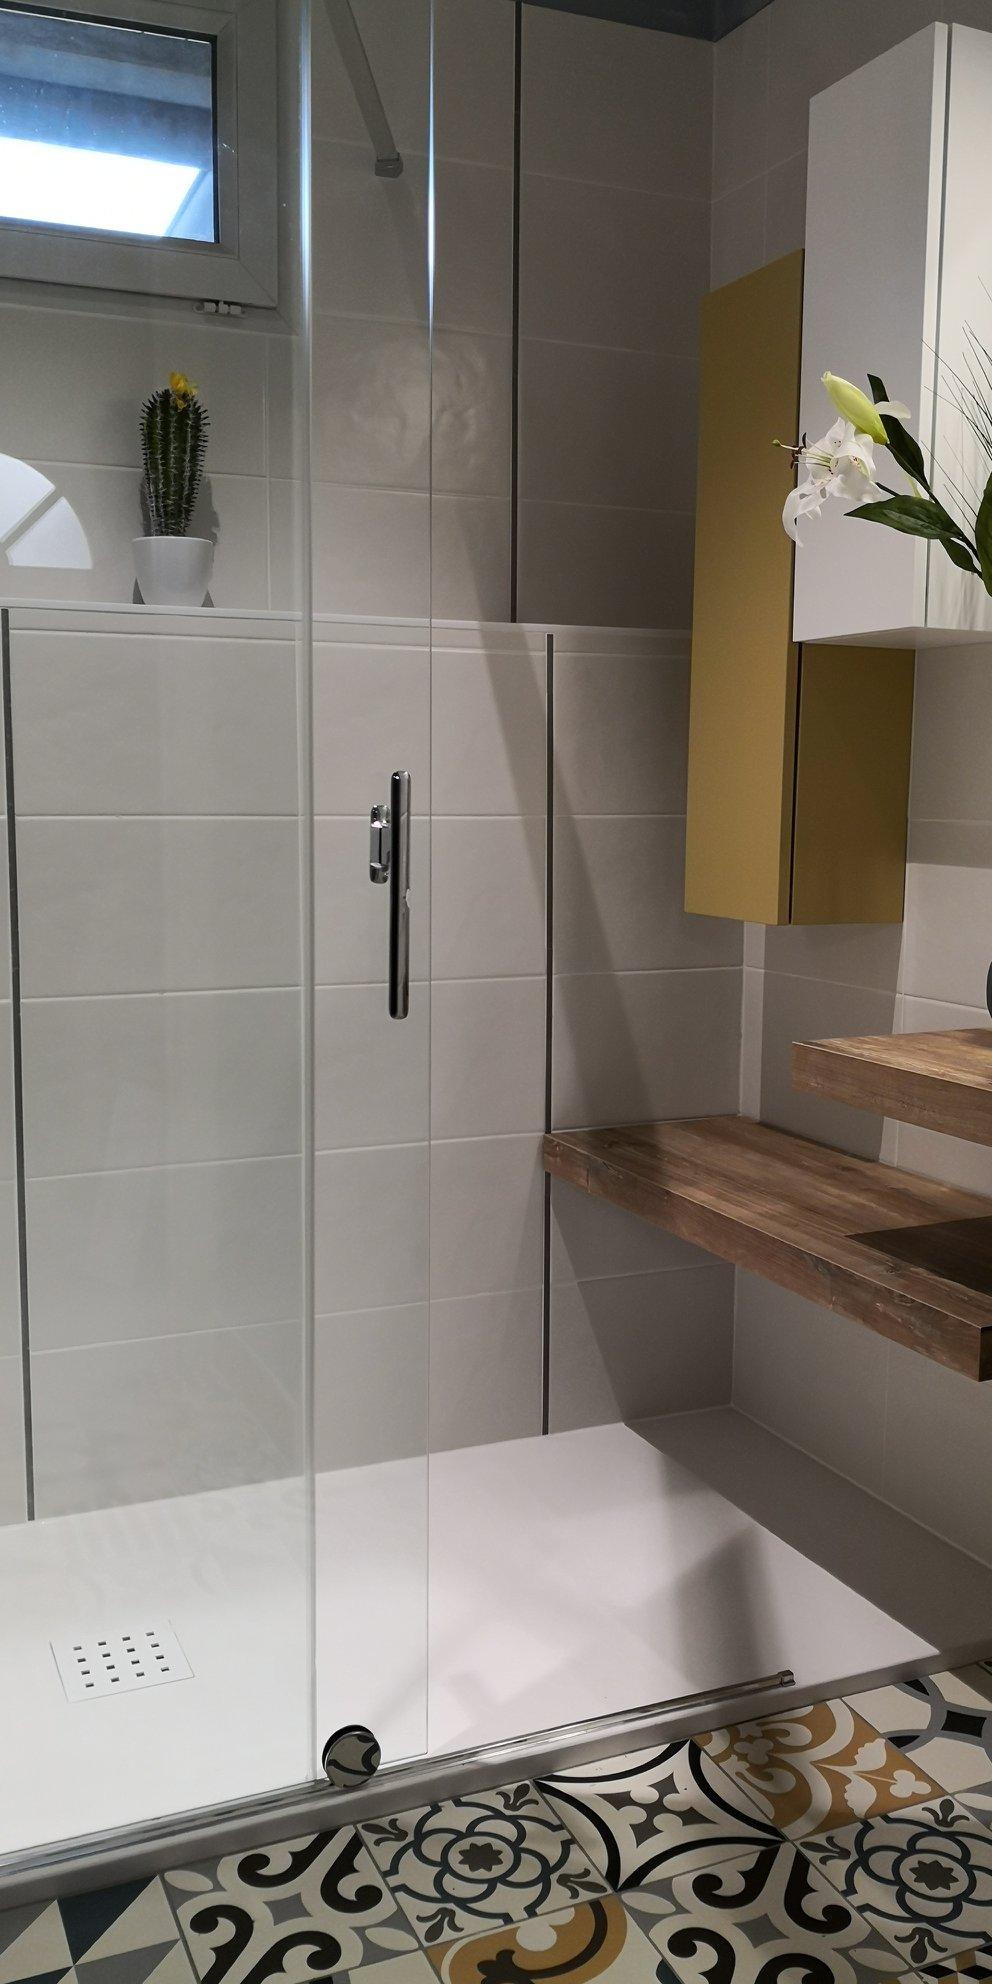 salle bain boheme chic douche